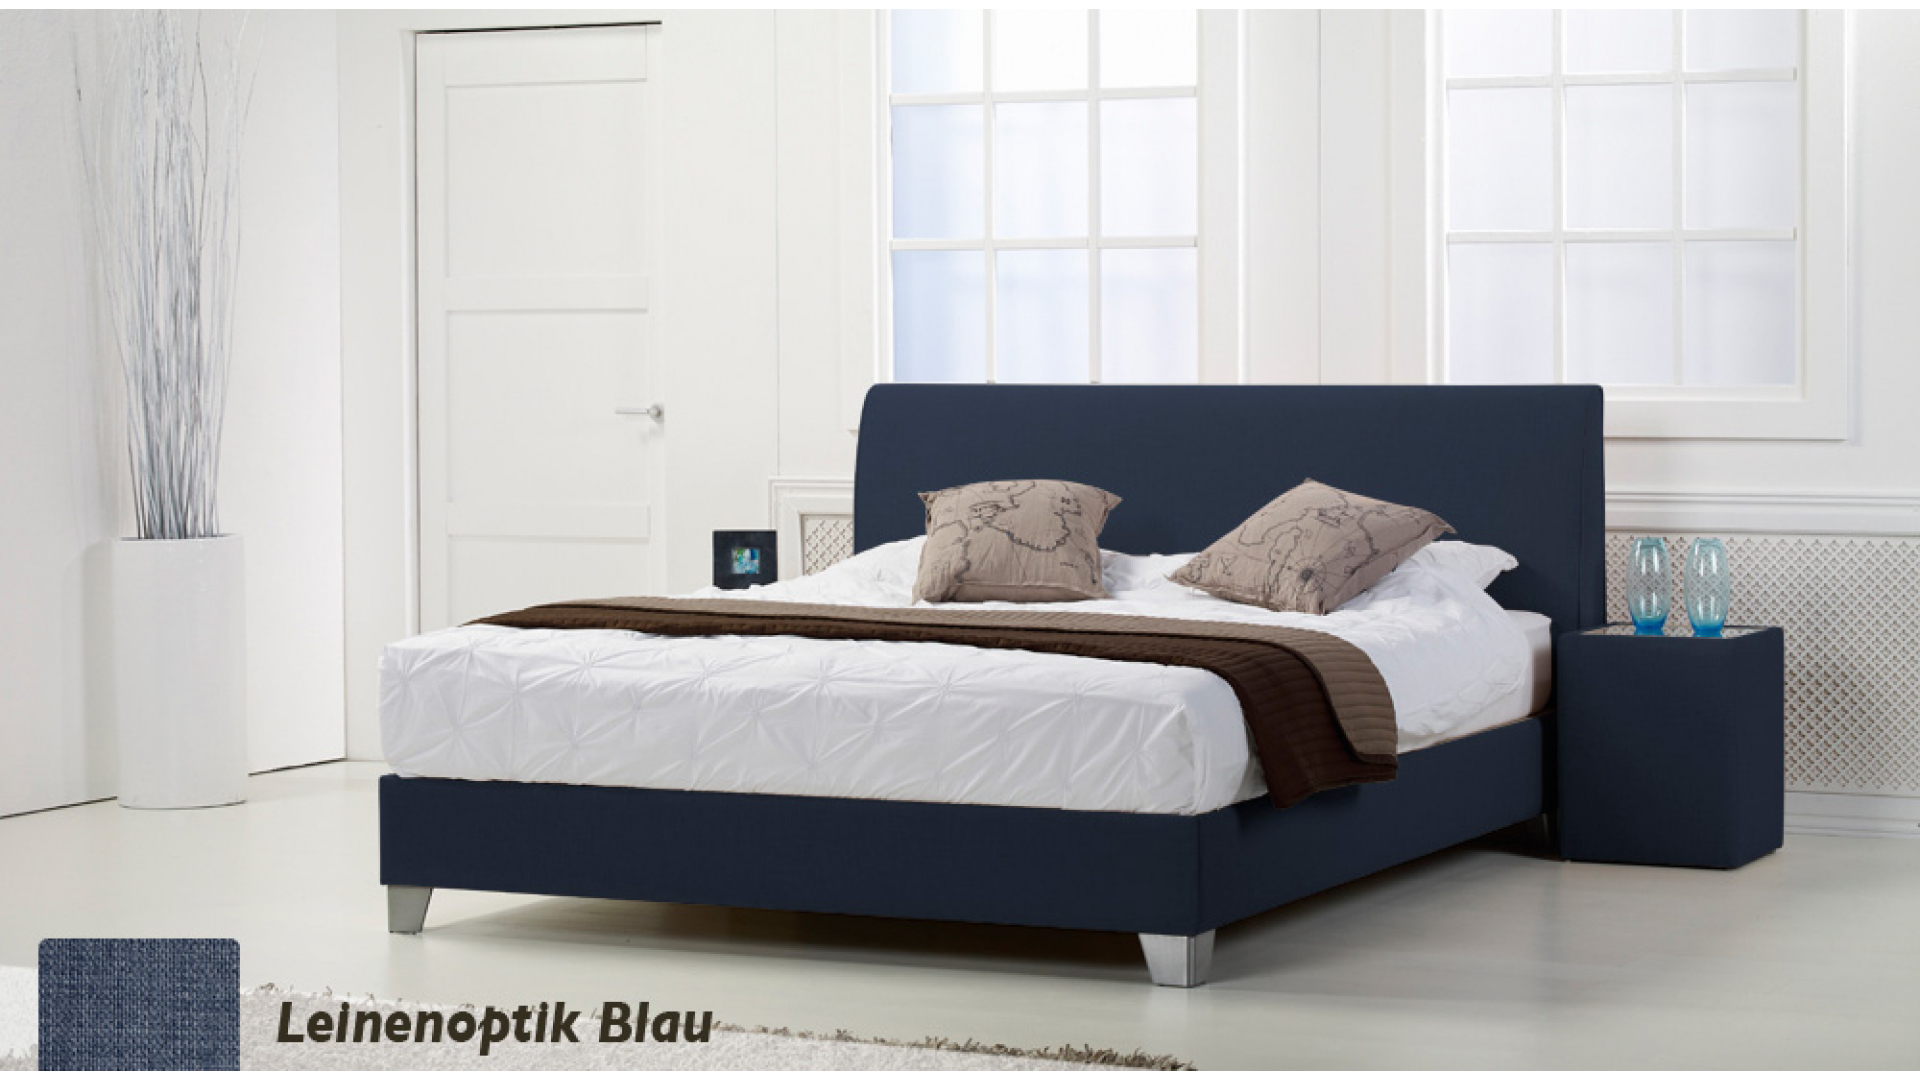 wasserbett basic box pro leinenoptik blau boxspring-look